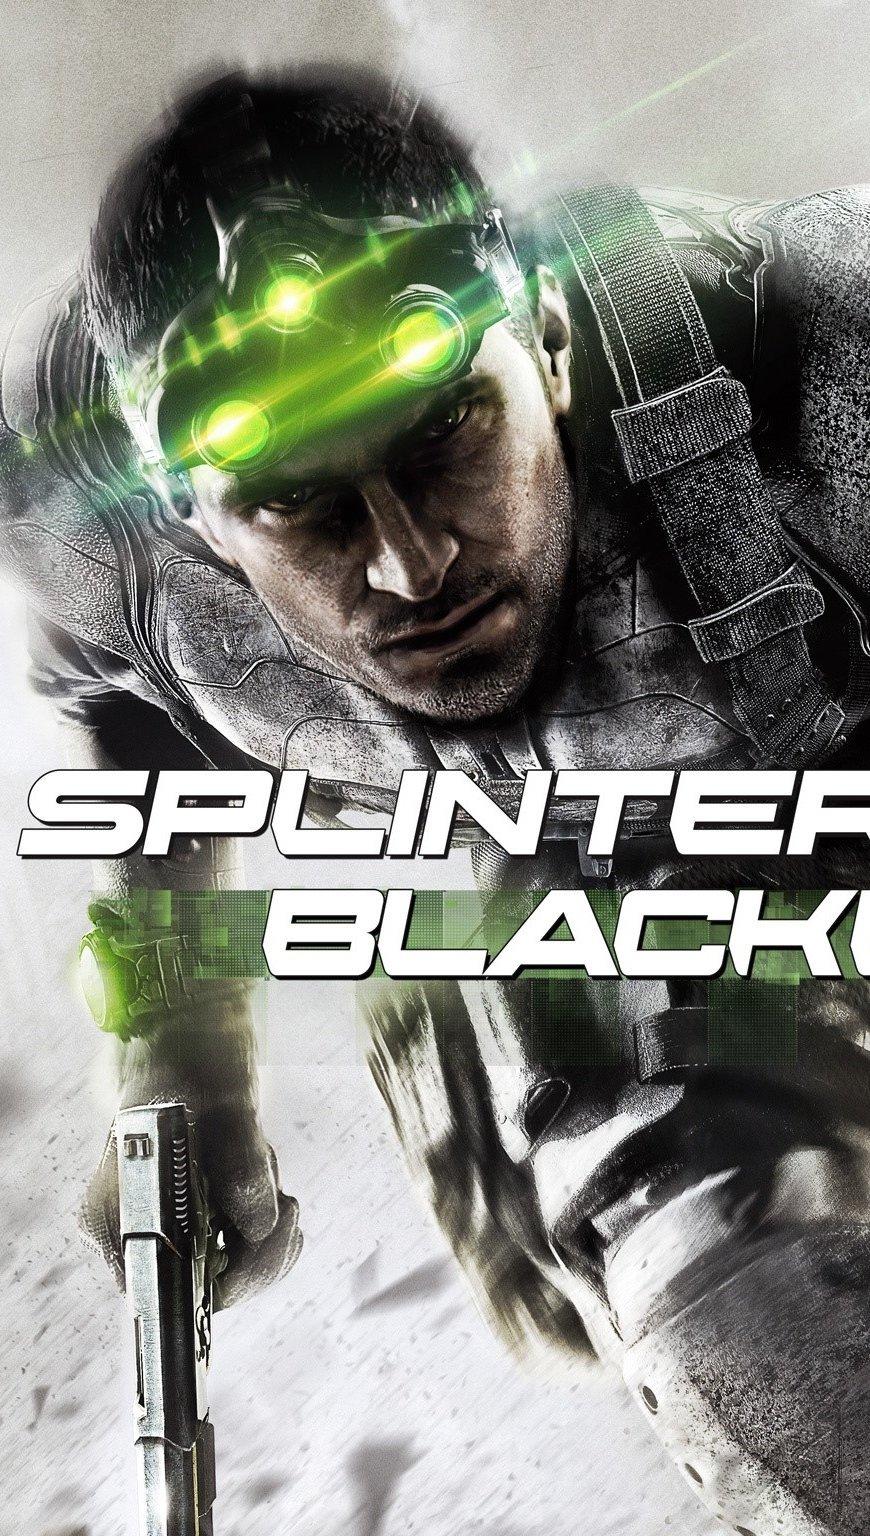 Fondos de pantalla Splinter Cell: Blacklist 2013 Vertical